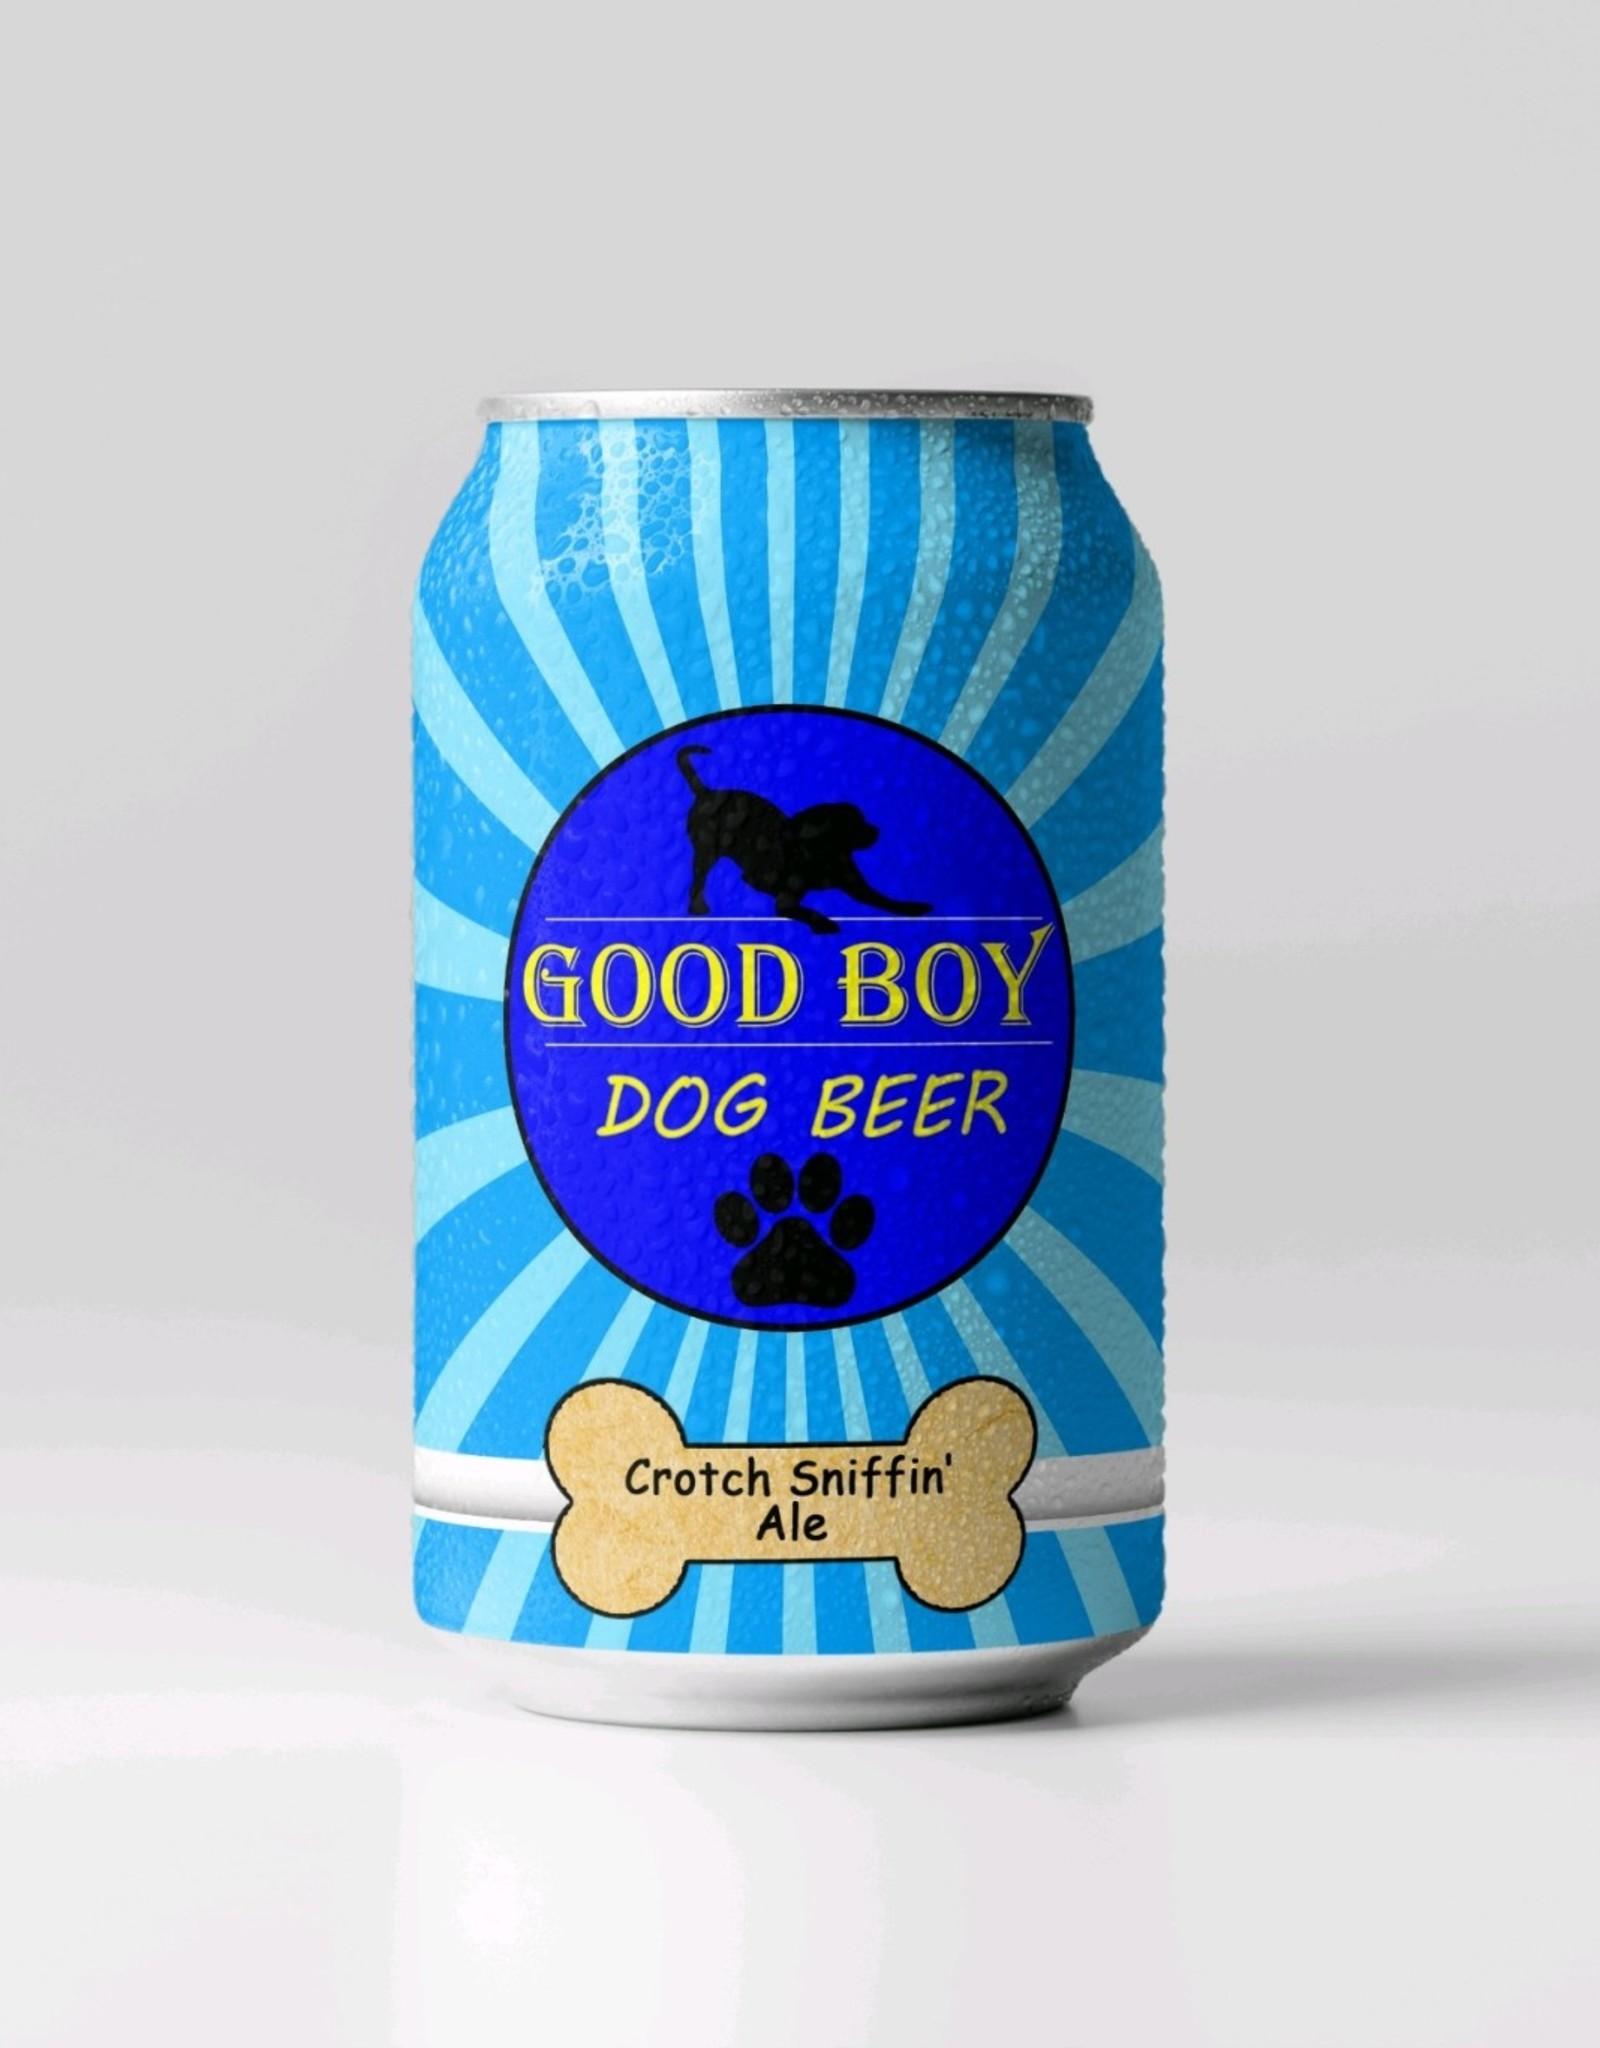 Good Boy Dog Beer Good Boy Dog Beer - Crotch Sniffin' Ale